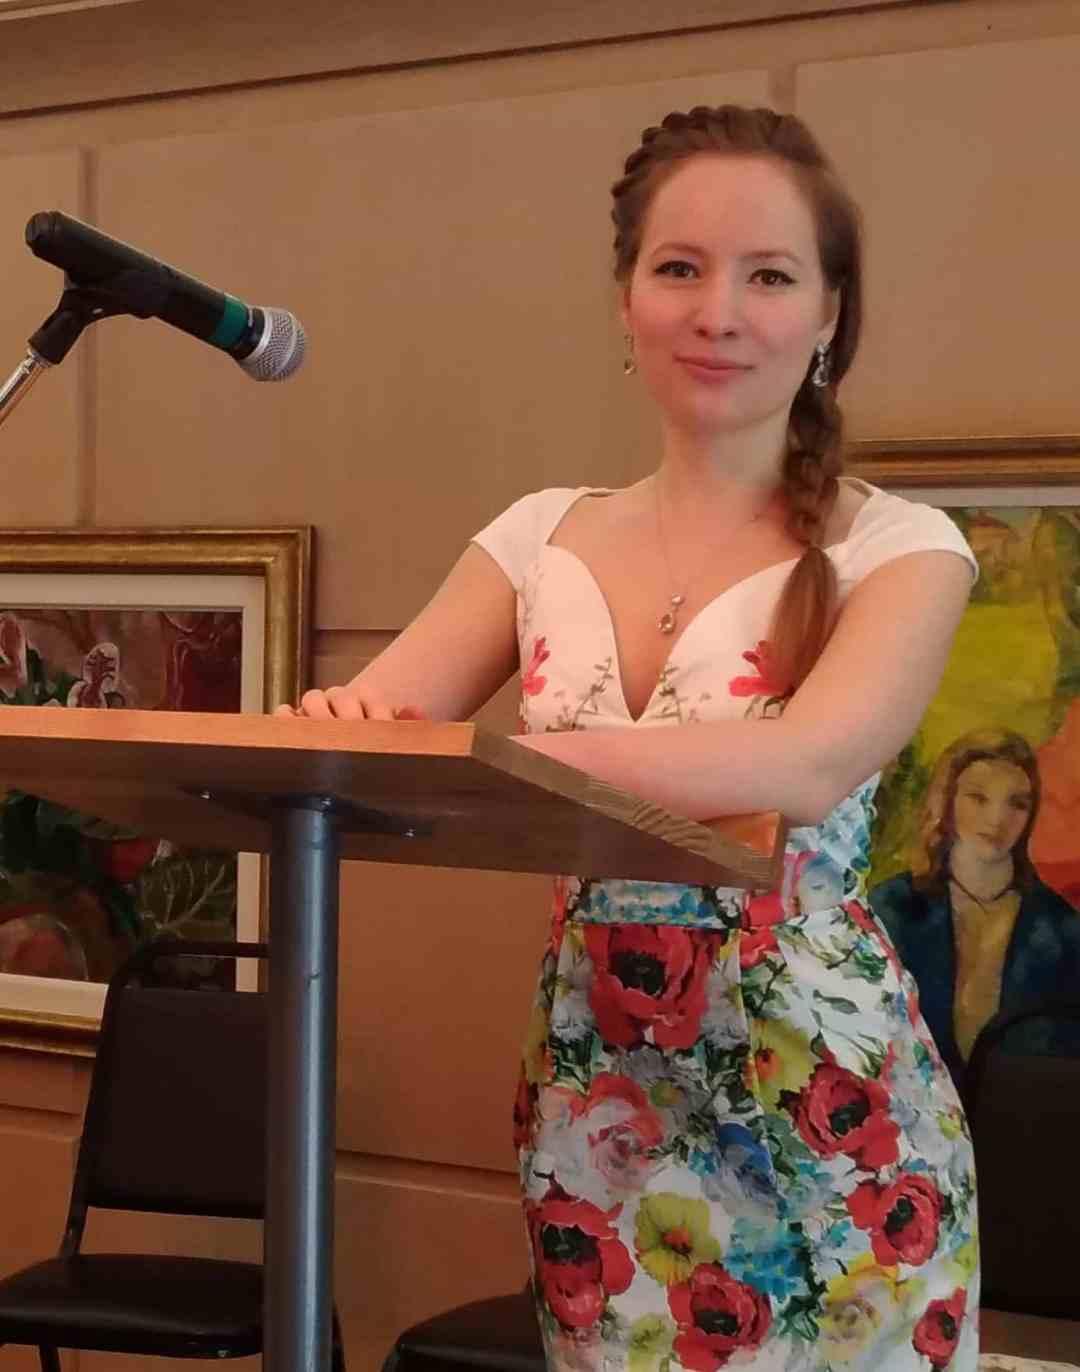 Daria Sera MD - About Daria Sera MD - Natural Fertility Specialist, and Natural Health Practitioner